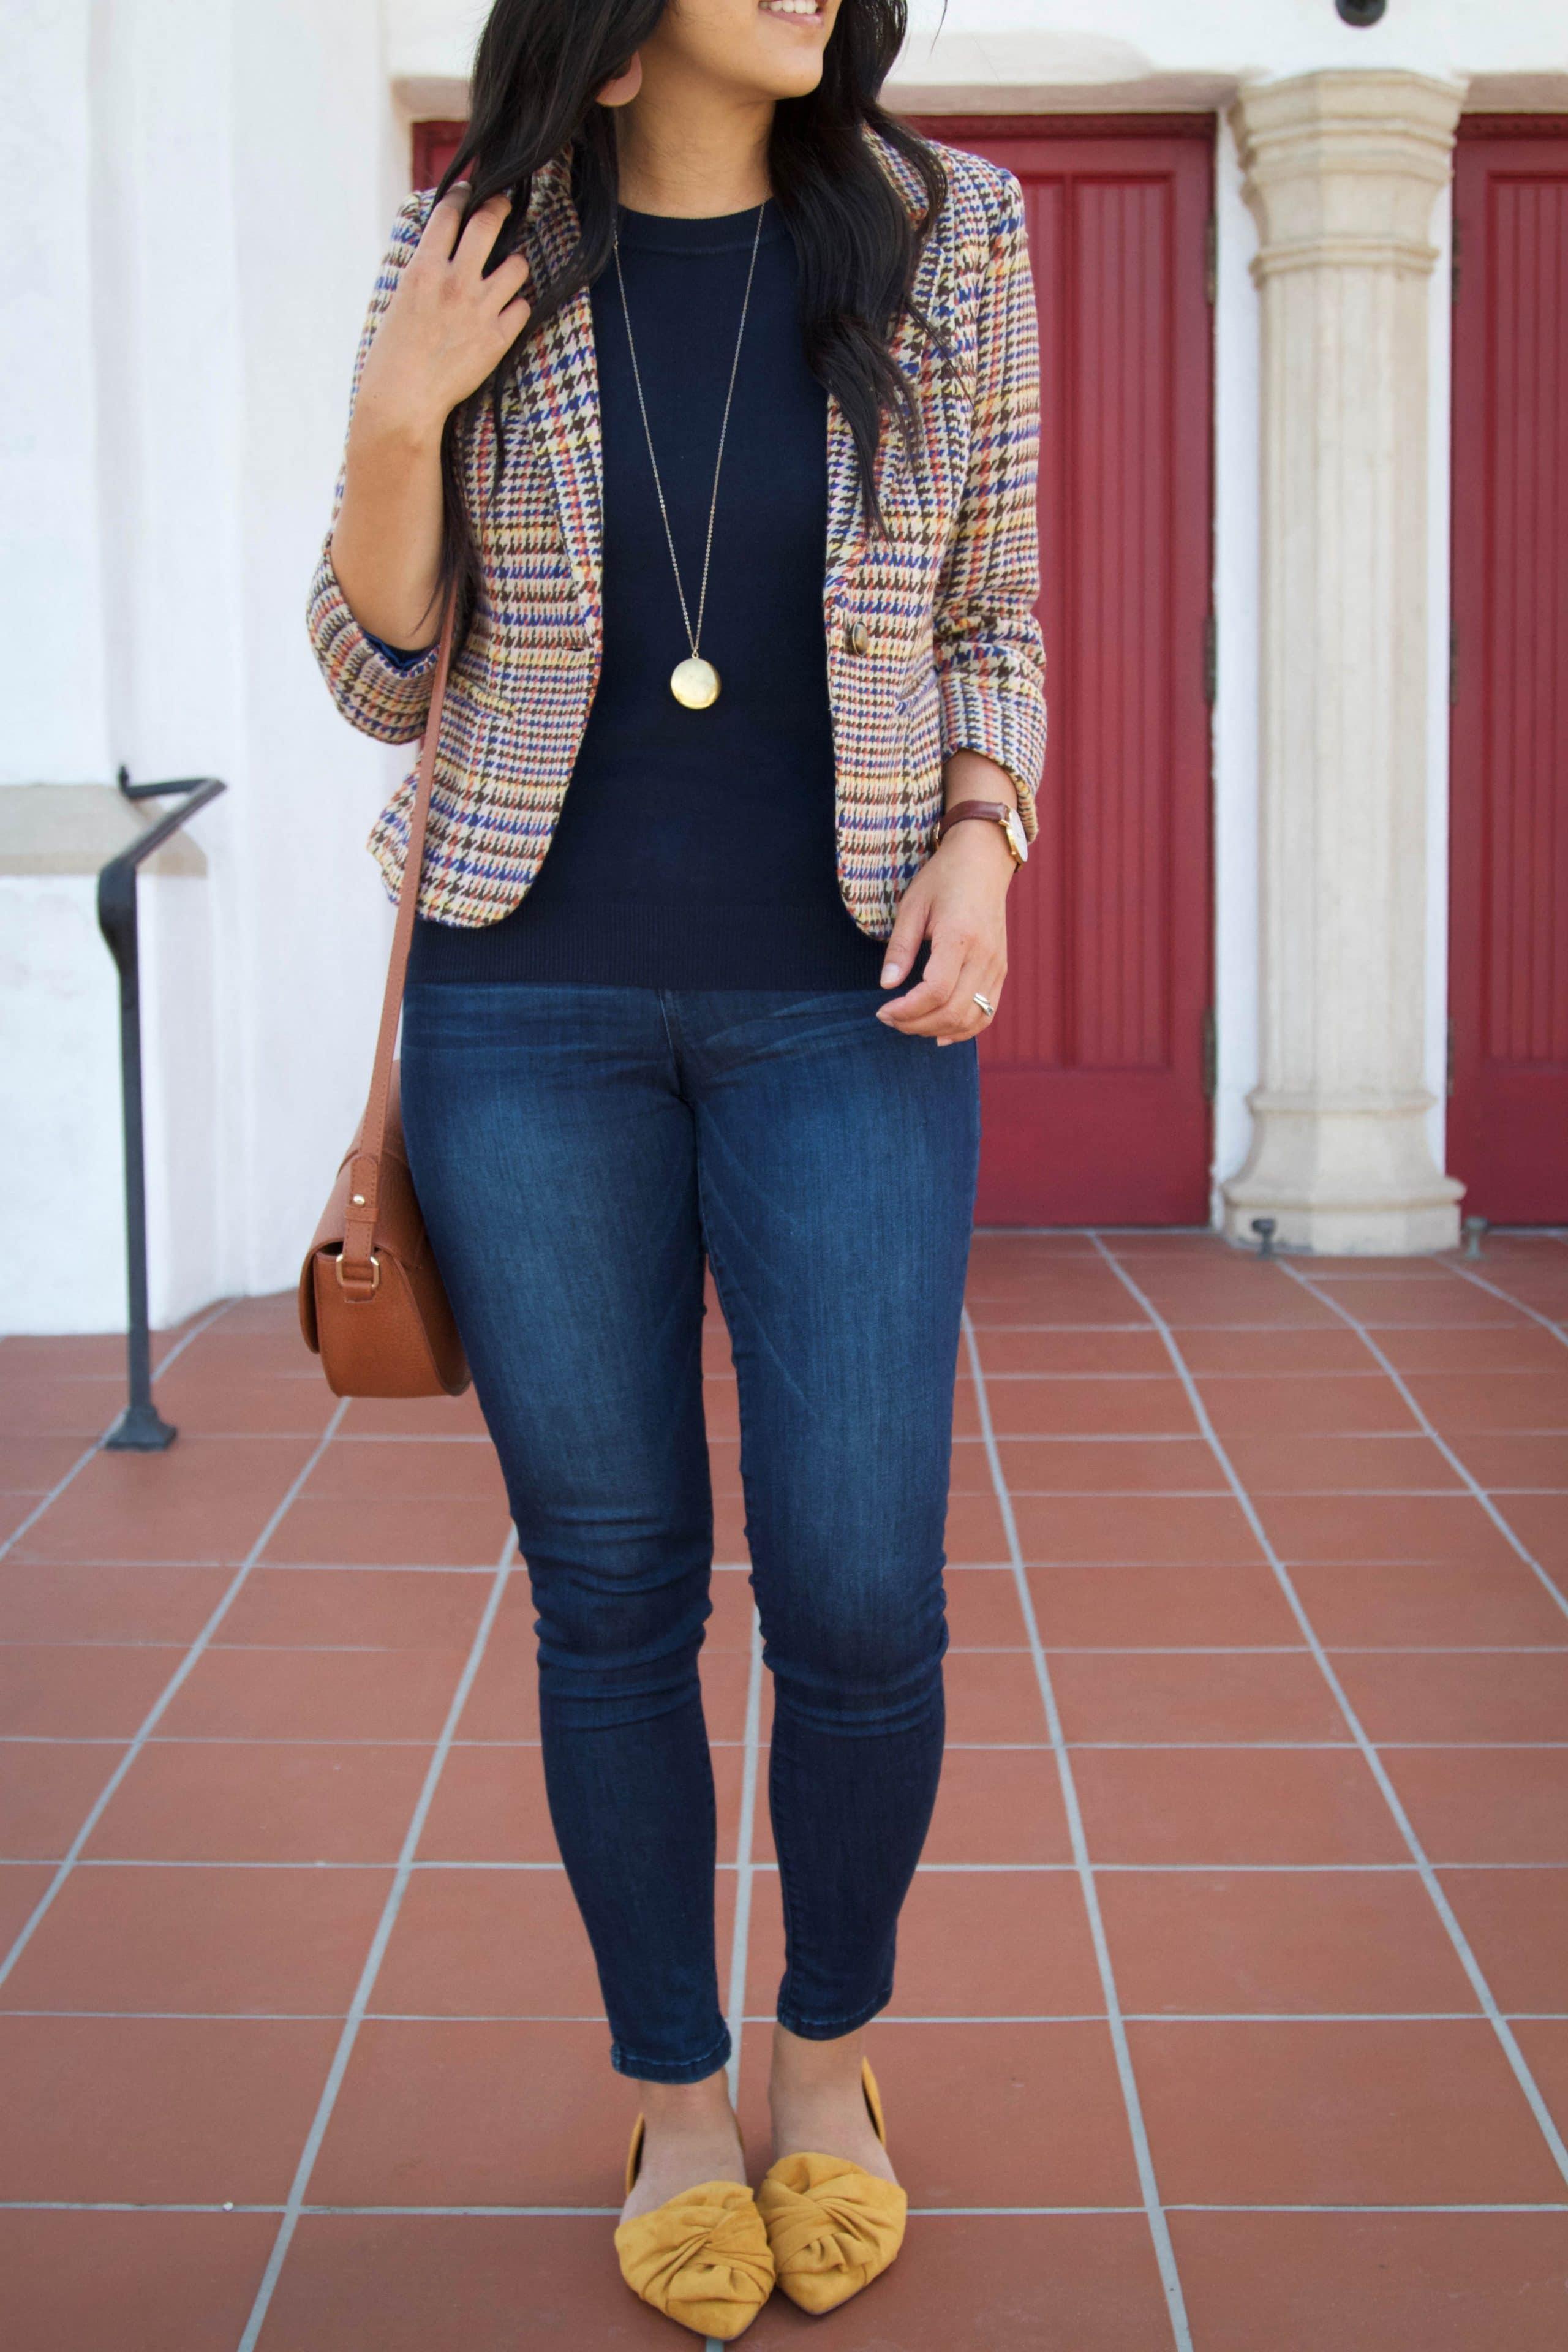 Tweed Blazer + Cognac Cross Body Bag + Mustard Flats + Skinnies